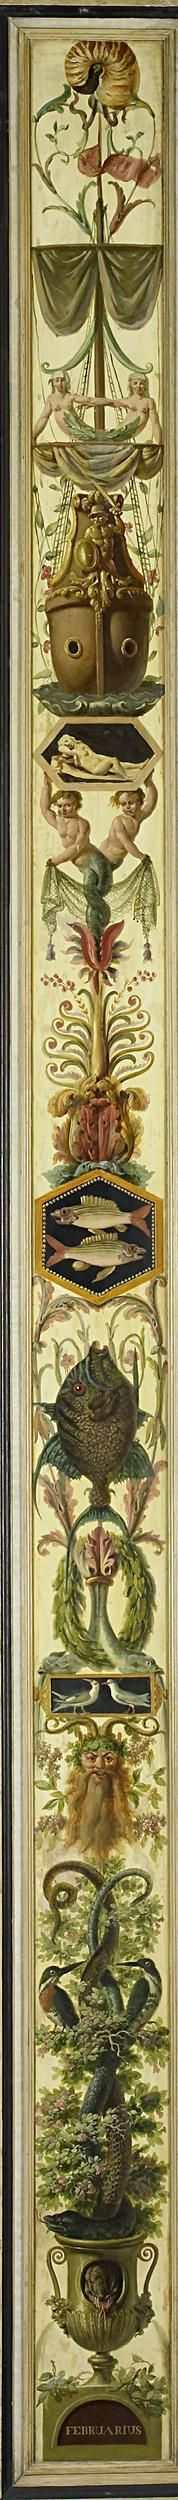 marinni: Jan Kamphuysen. Grotesque panel